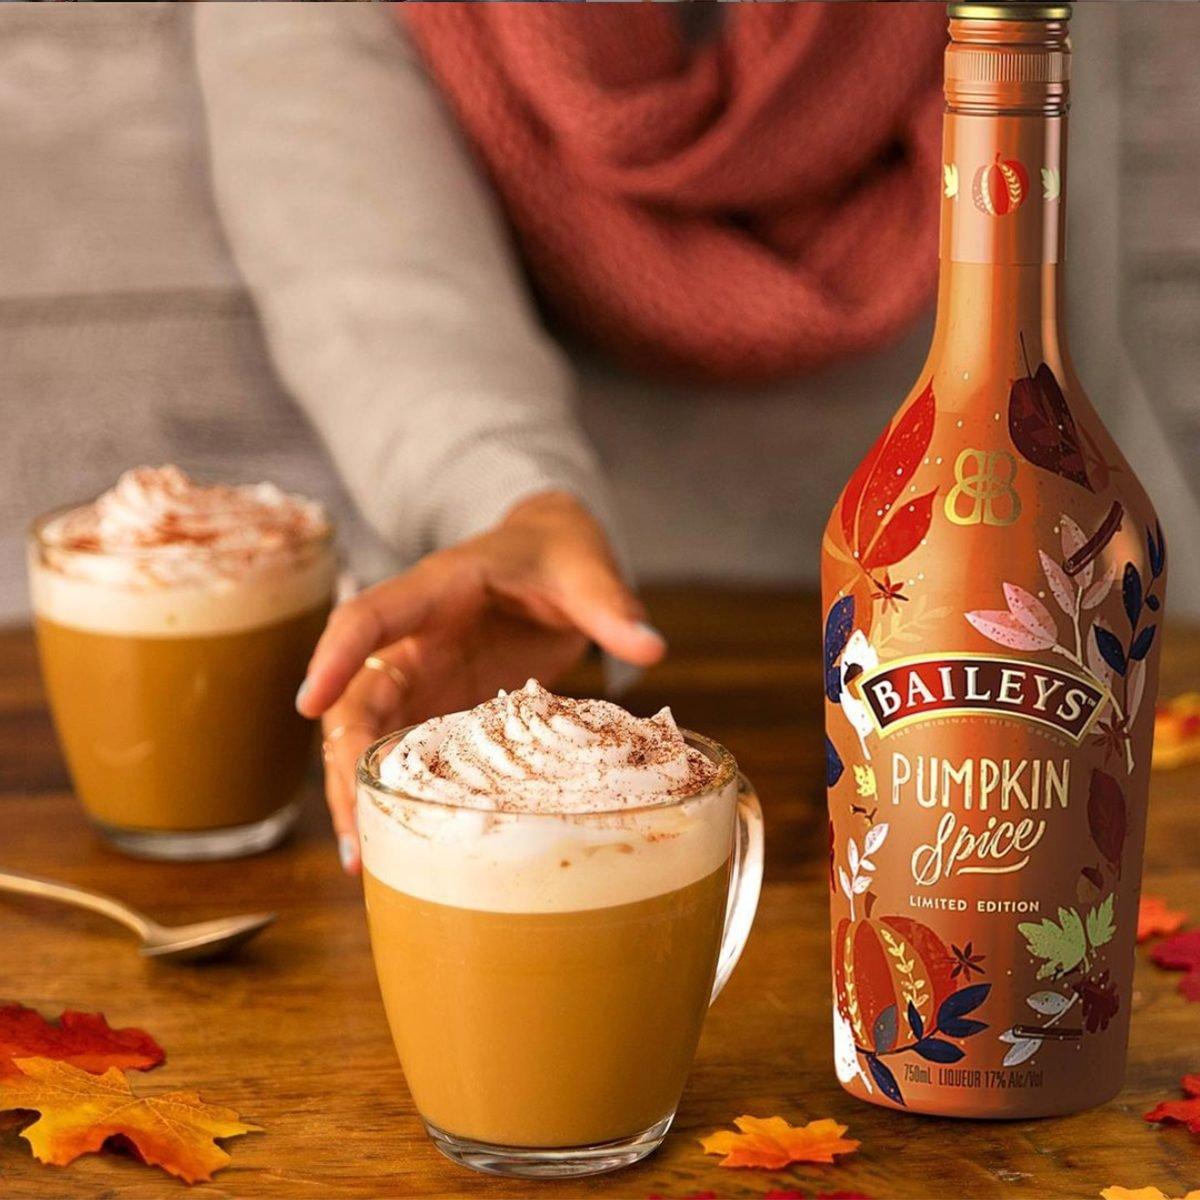 Baileys-Pumpkin-Spice.jpg